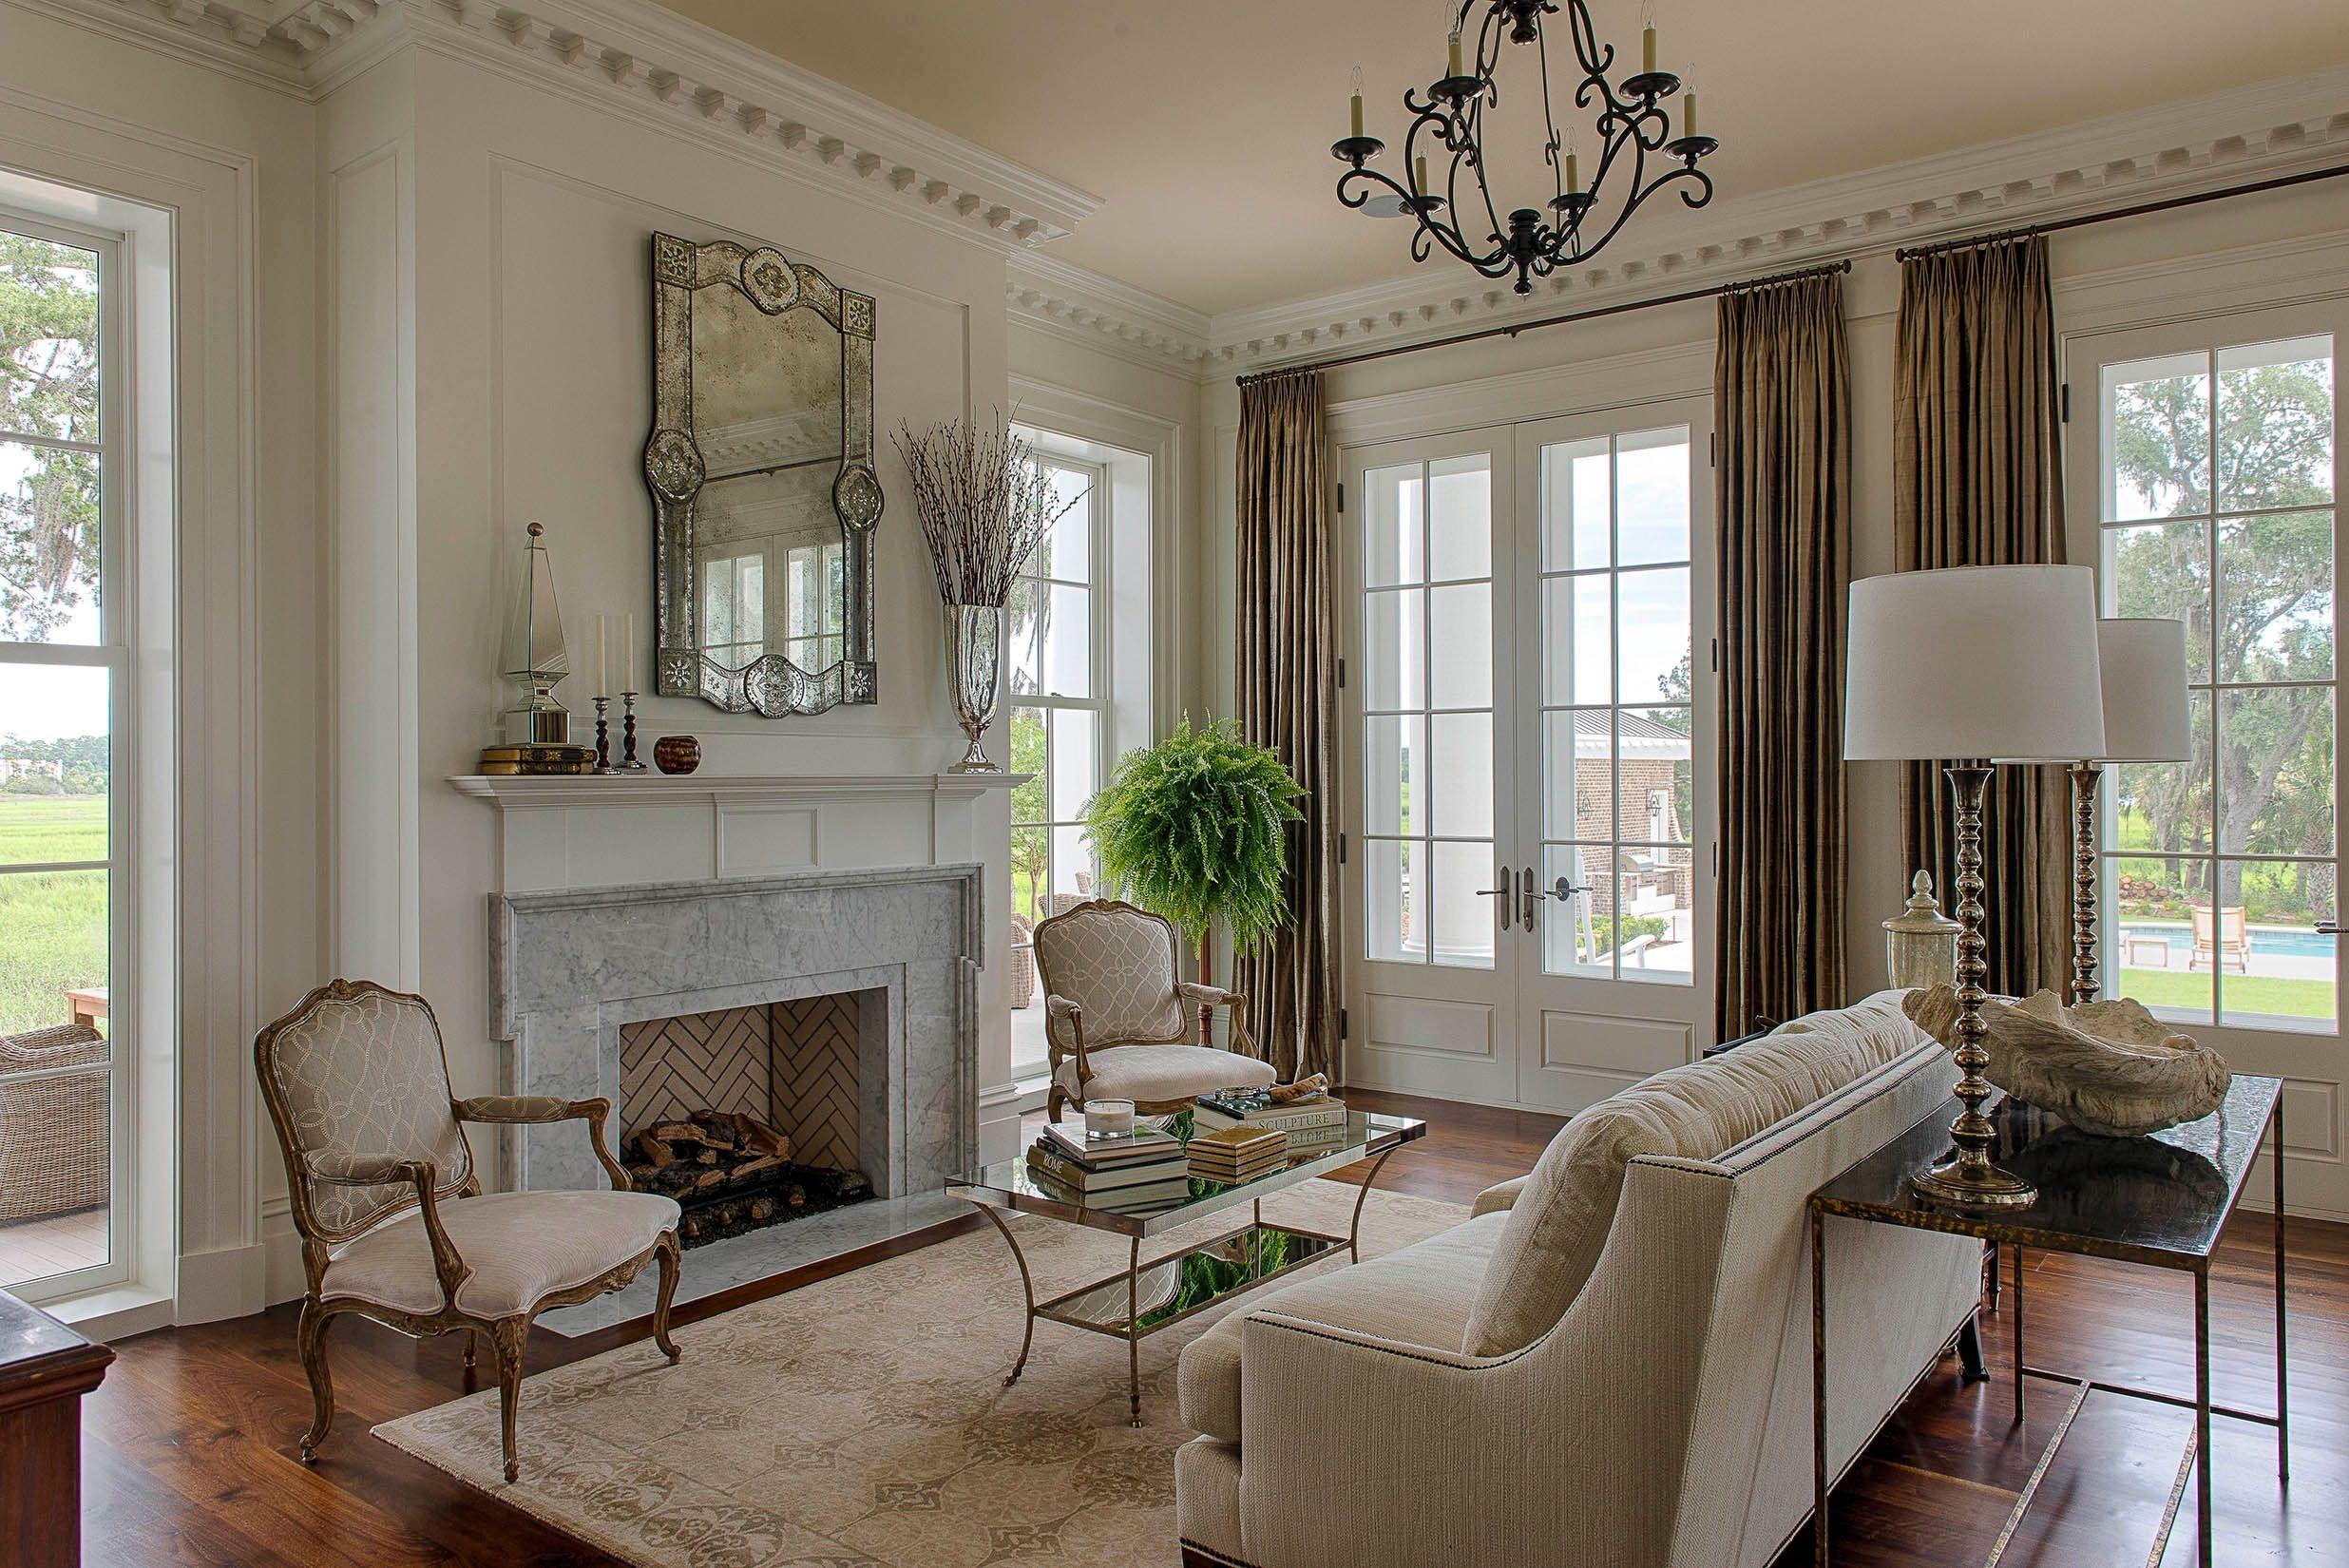 rentalre of photo staging georgia txfurniture full tx rental size homes for home inspirations austin shocking furniture